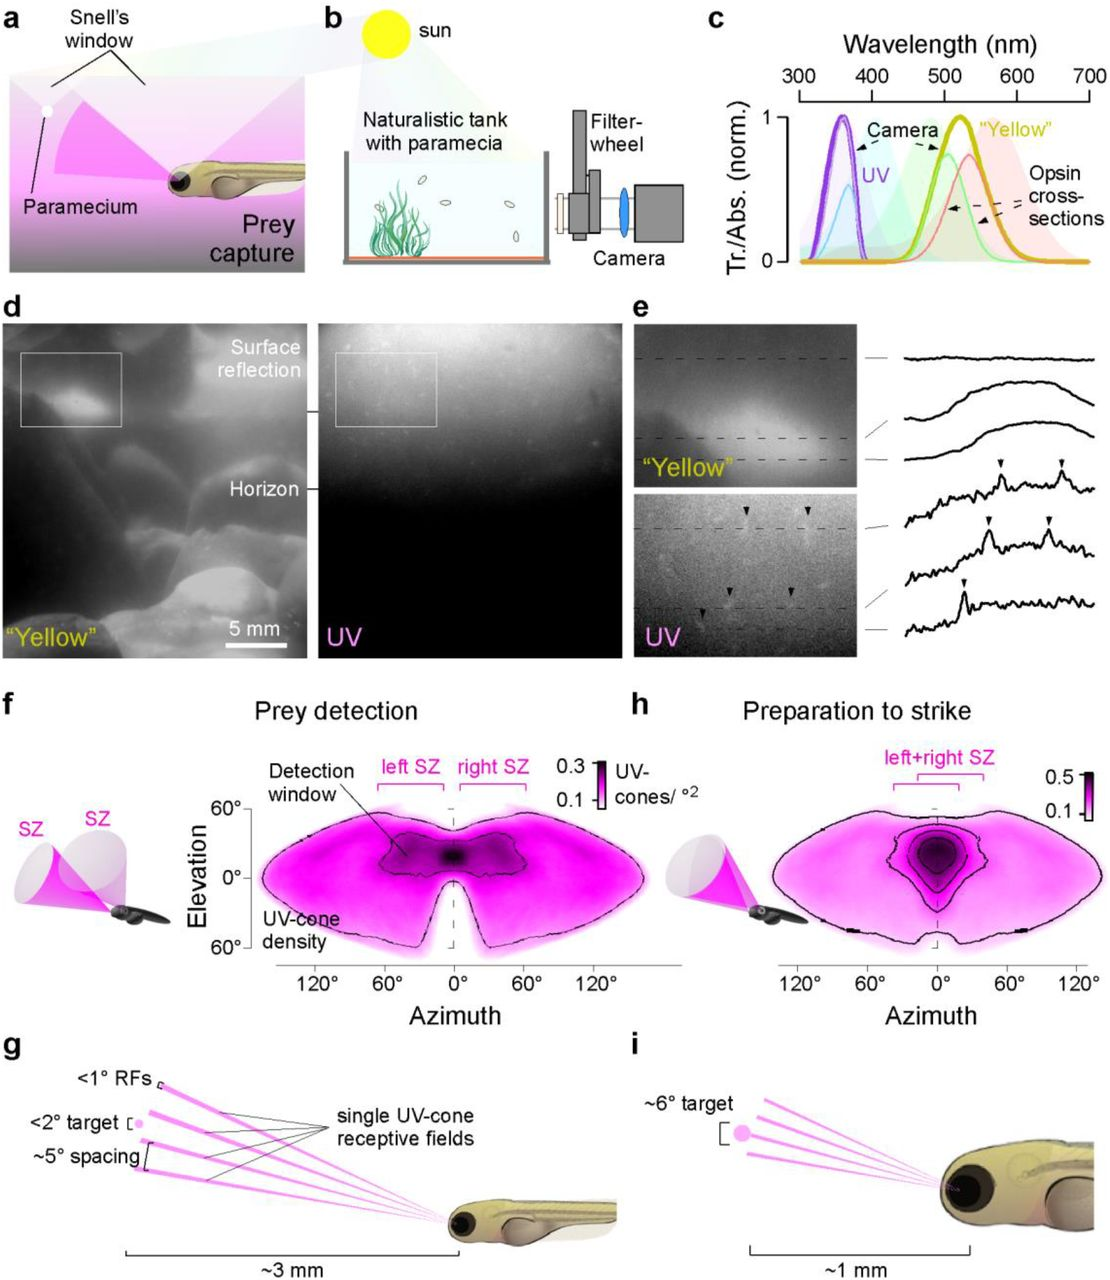 Cellular and molecular mechanisms of photoreceptor tuning